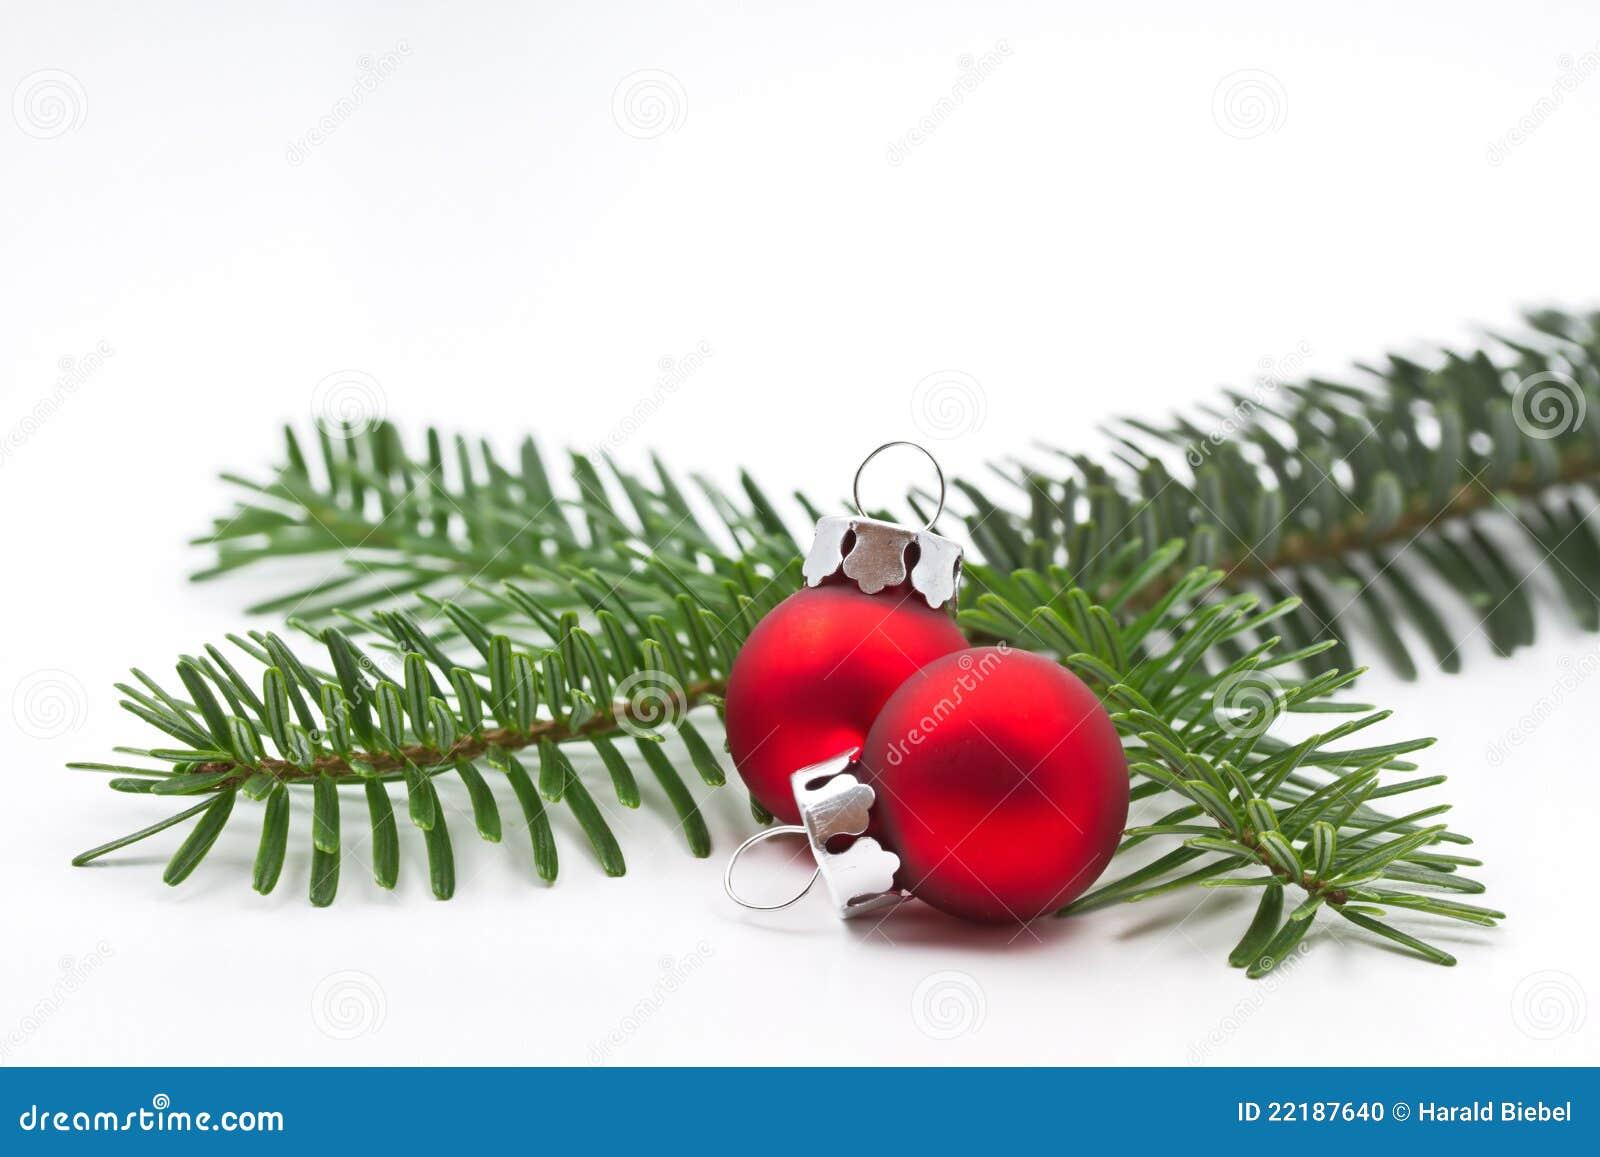 White Twig Christmas Tree